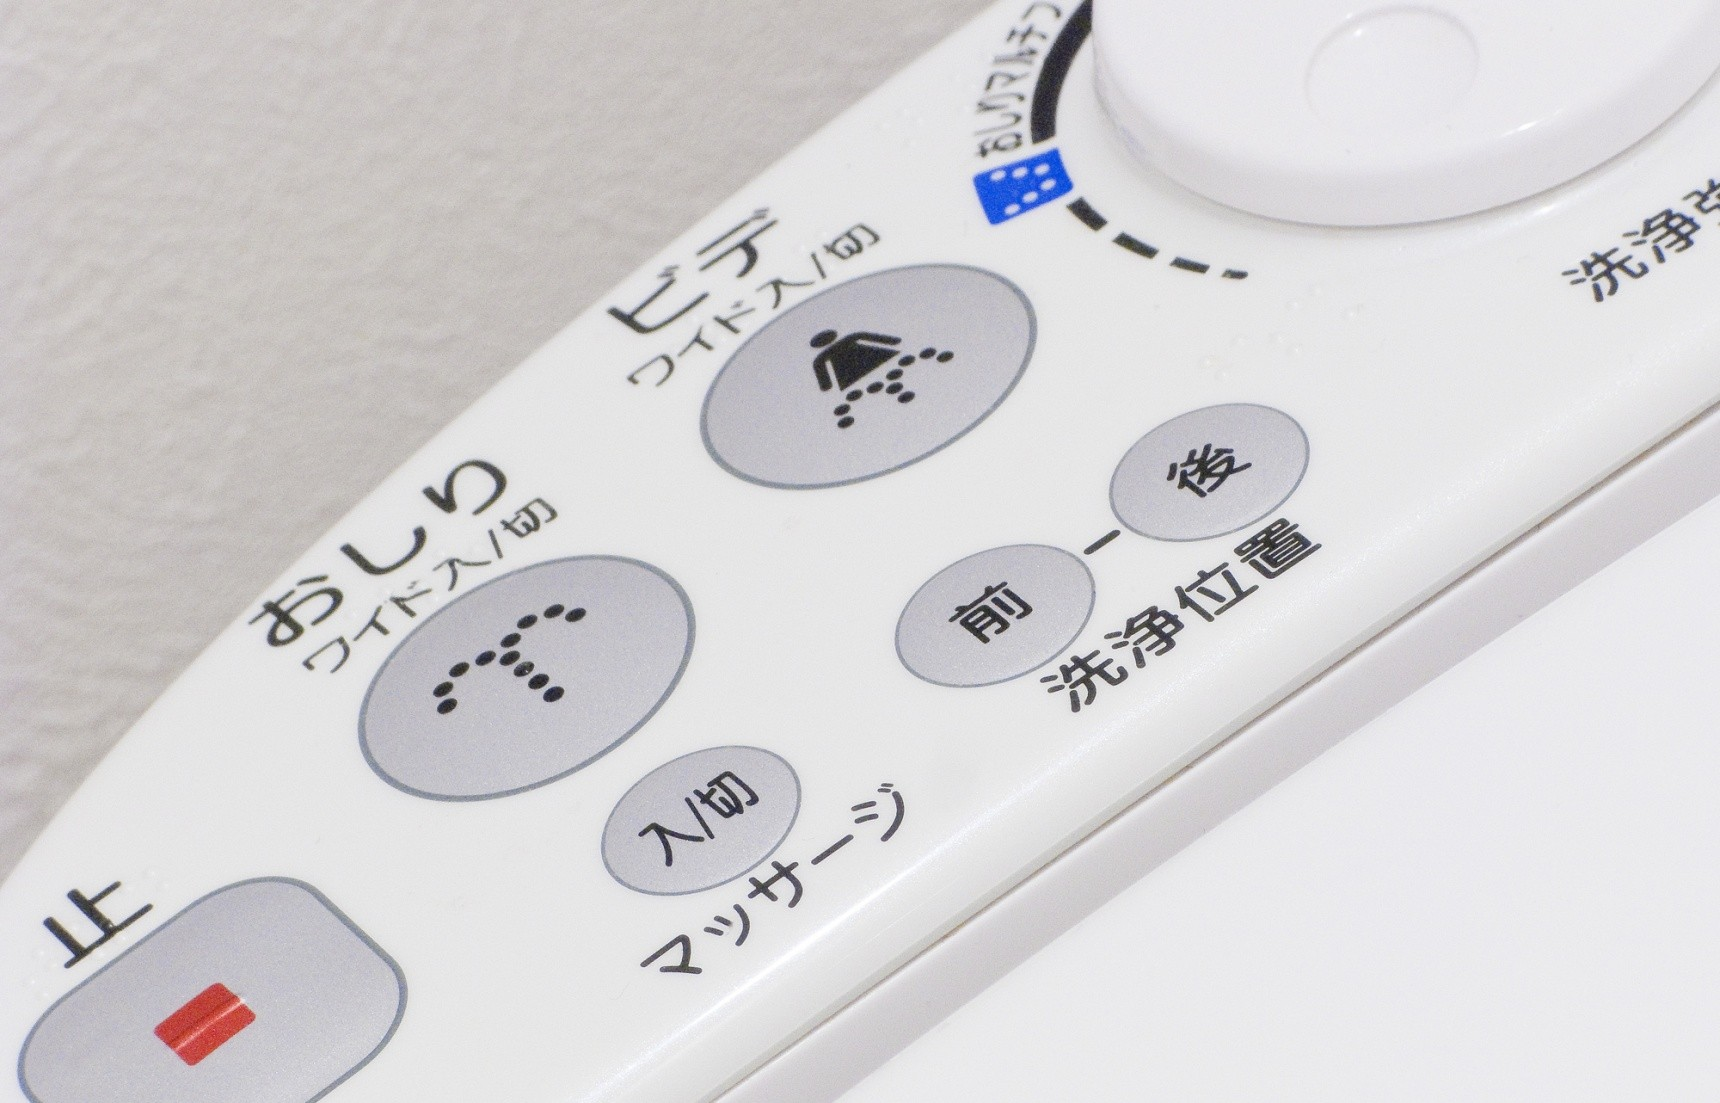 Japanese electronic bidet remote control panel.